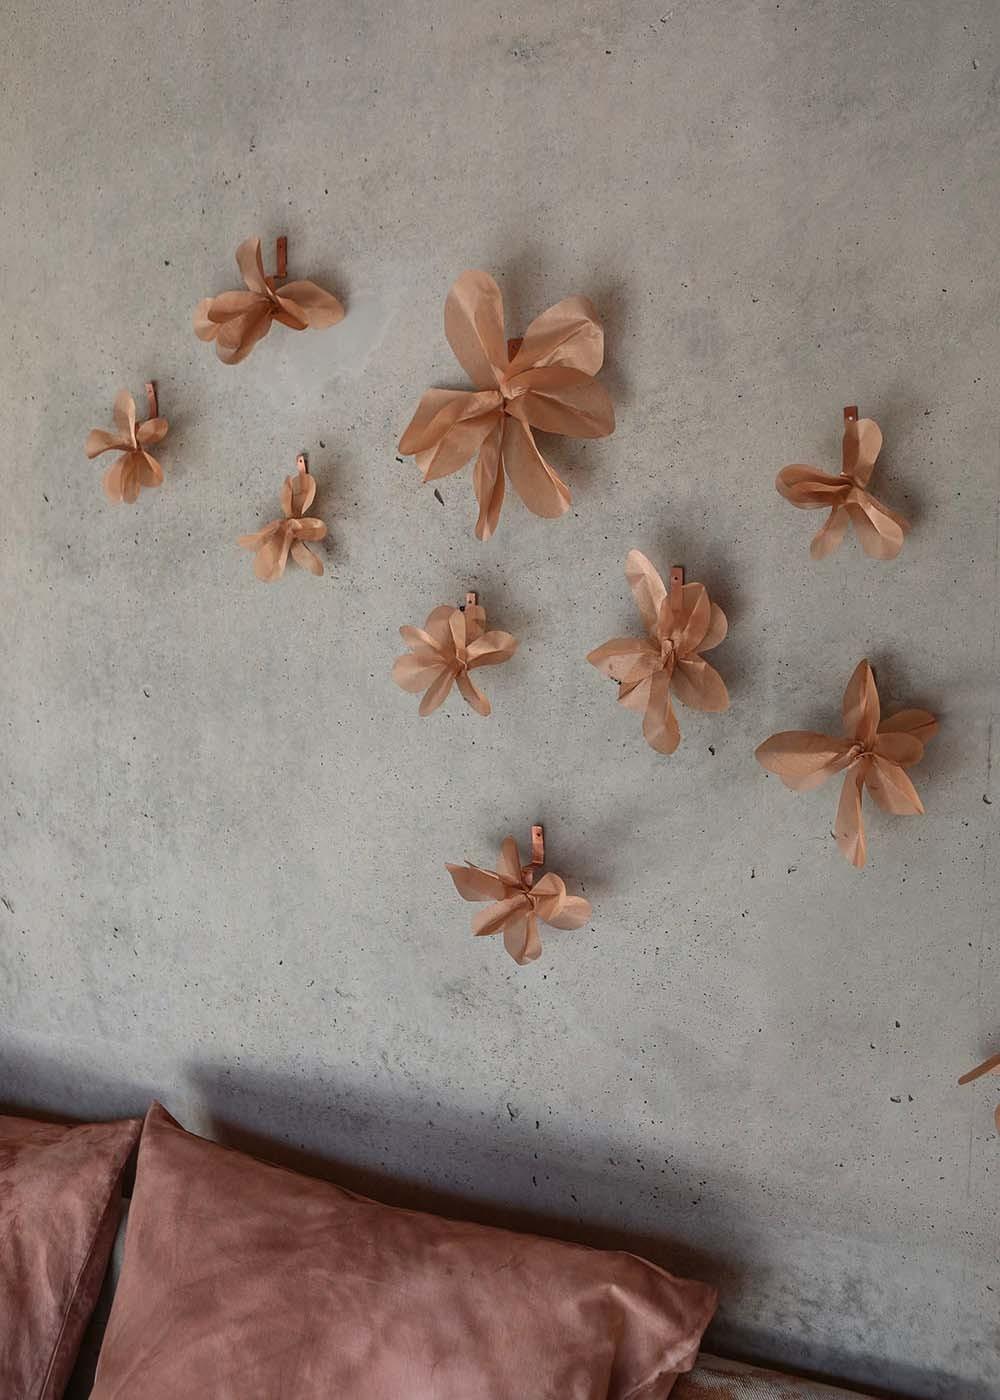 Magnolias, the little flowers